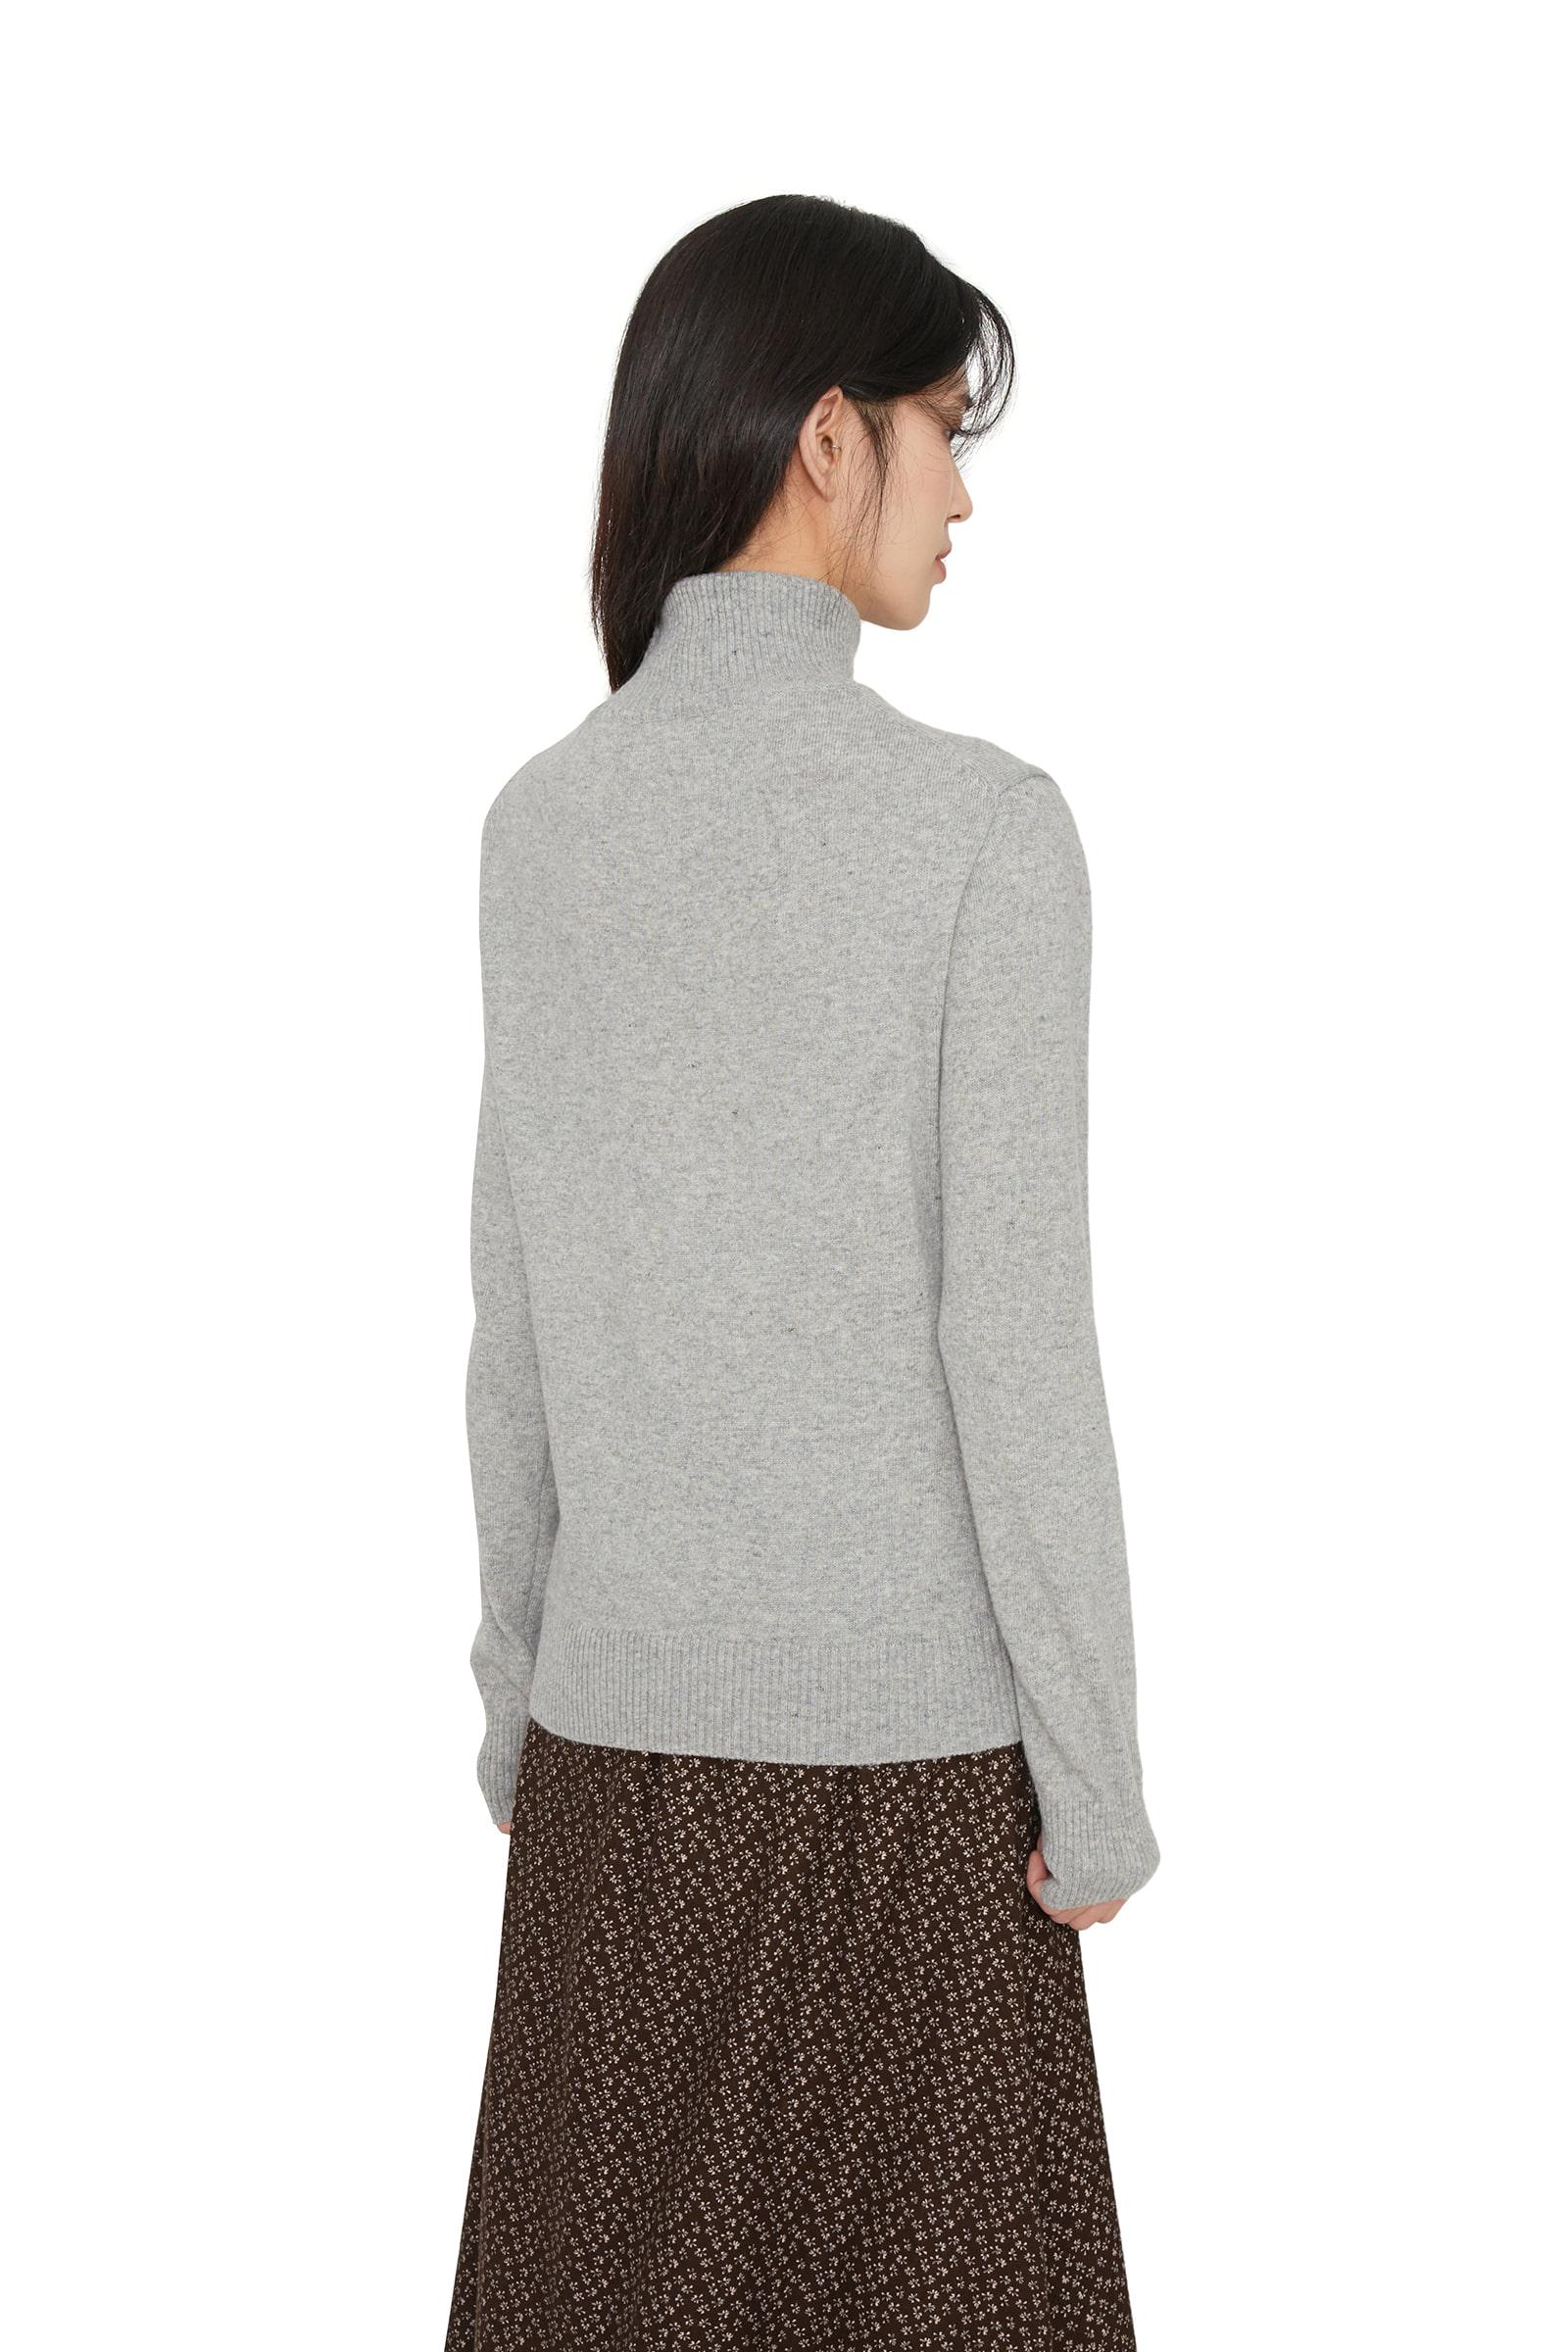 Modine punching turtleneck knit